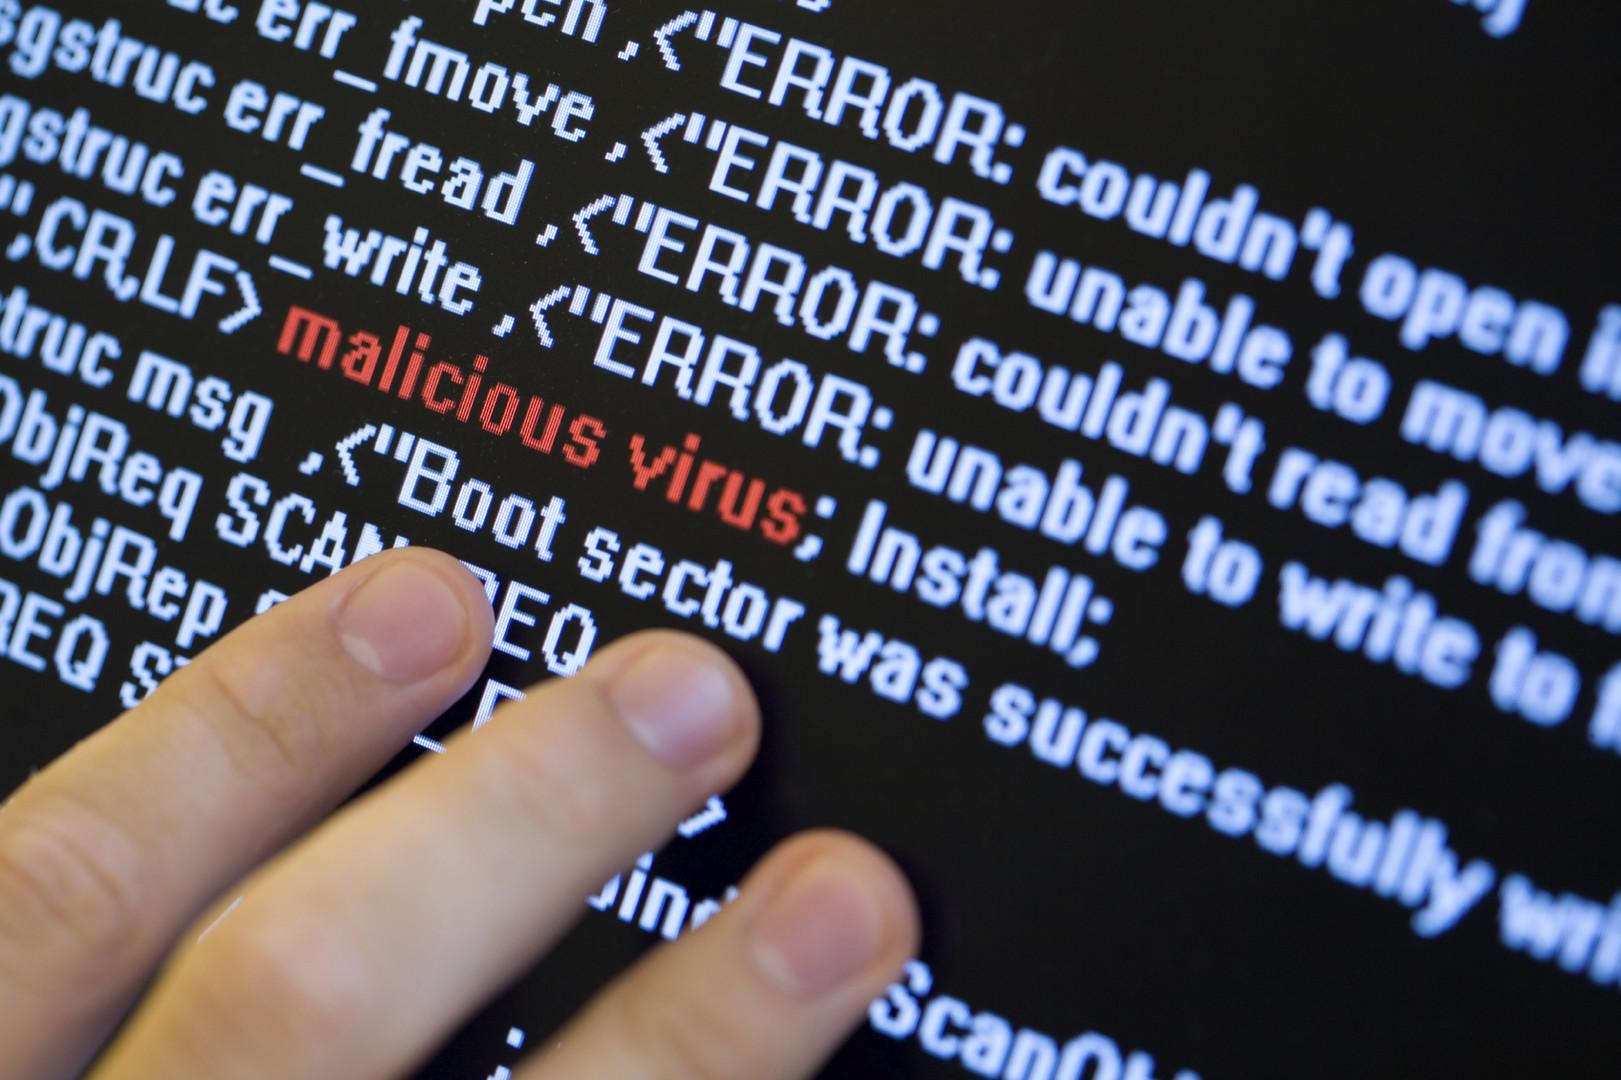 Атака без границ: организации в десятках стран пострадали от вируса-вымогателя WannaCry